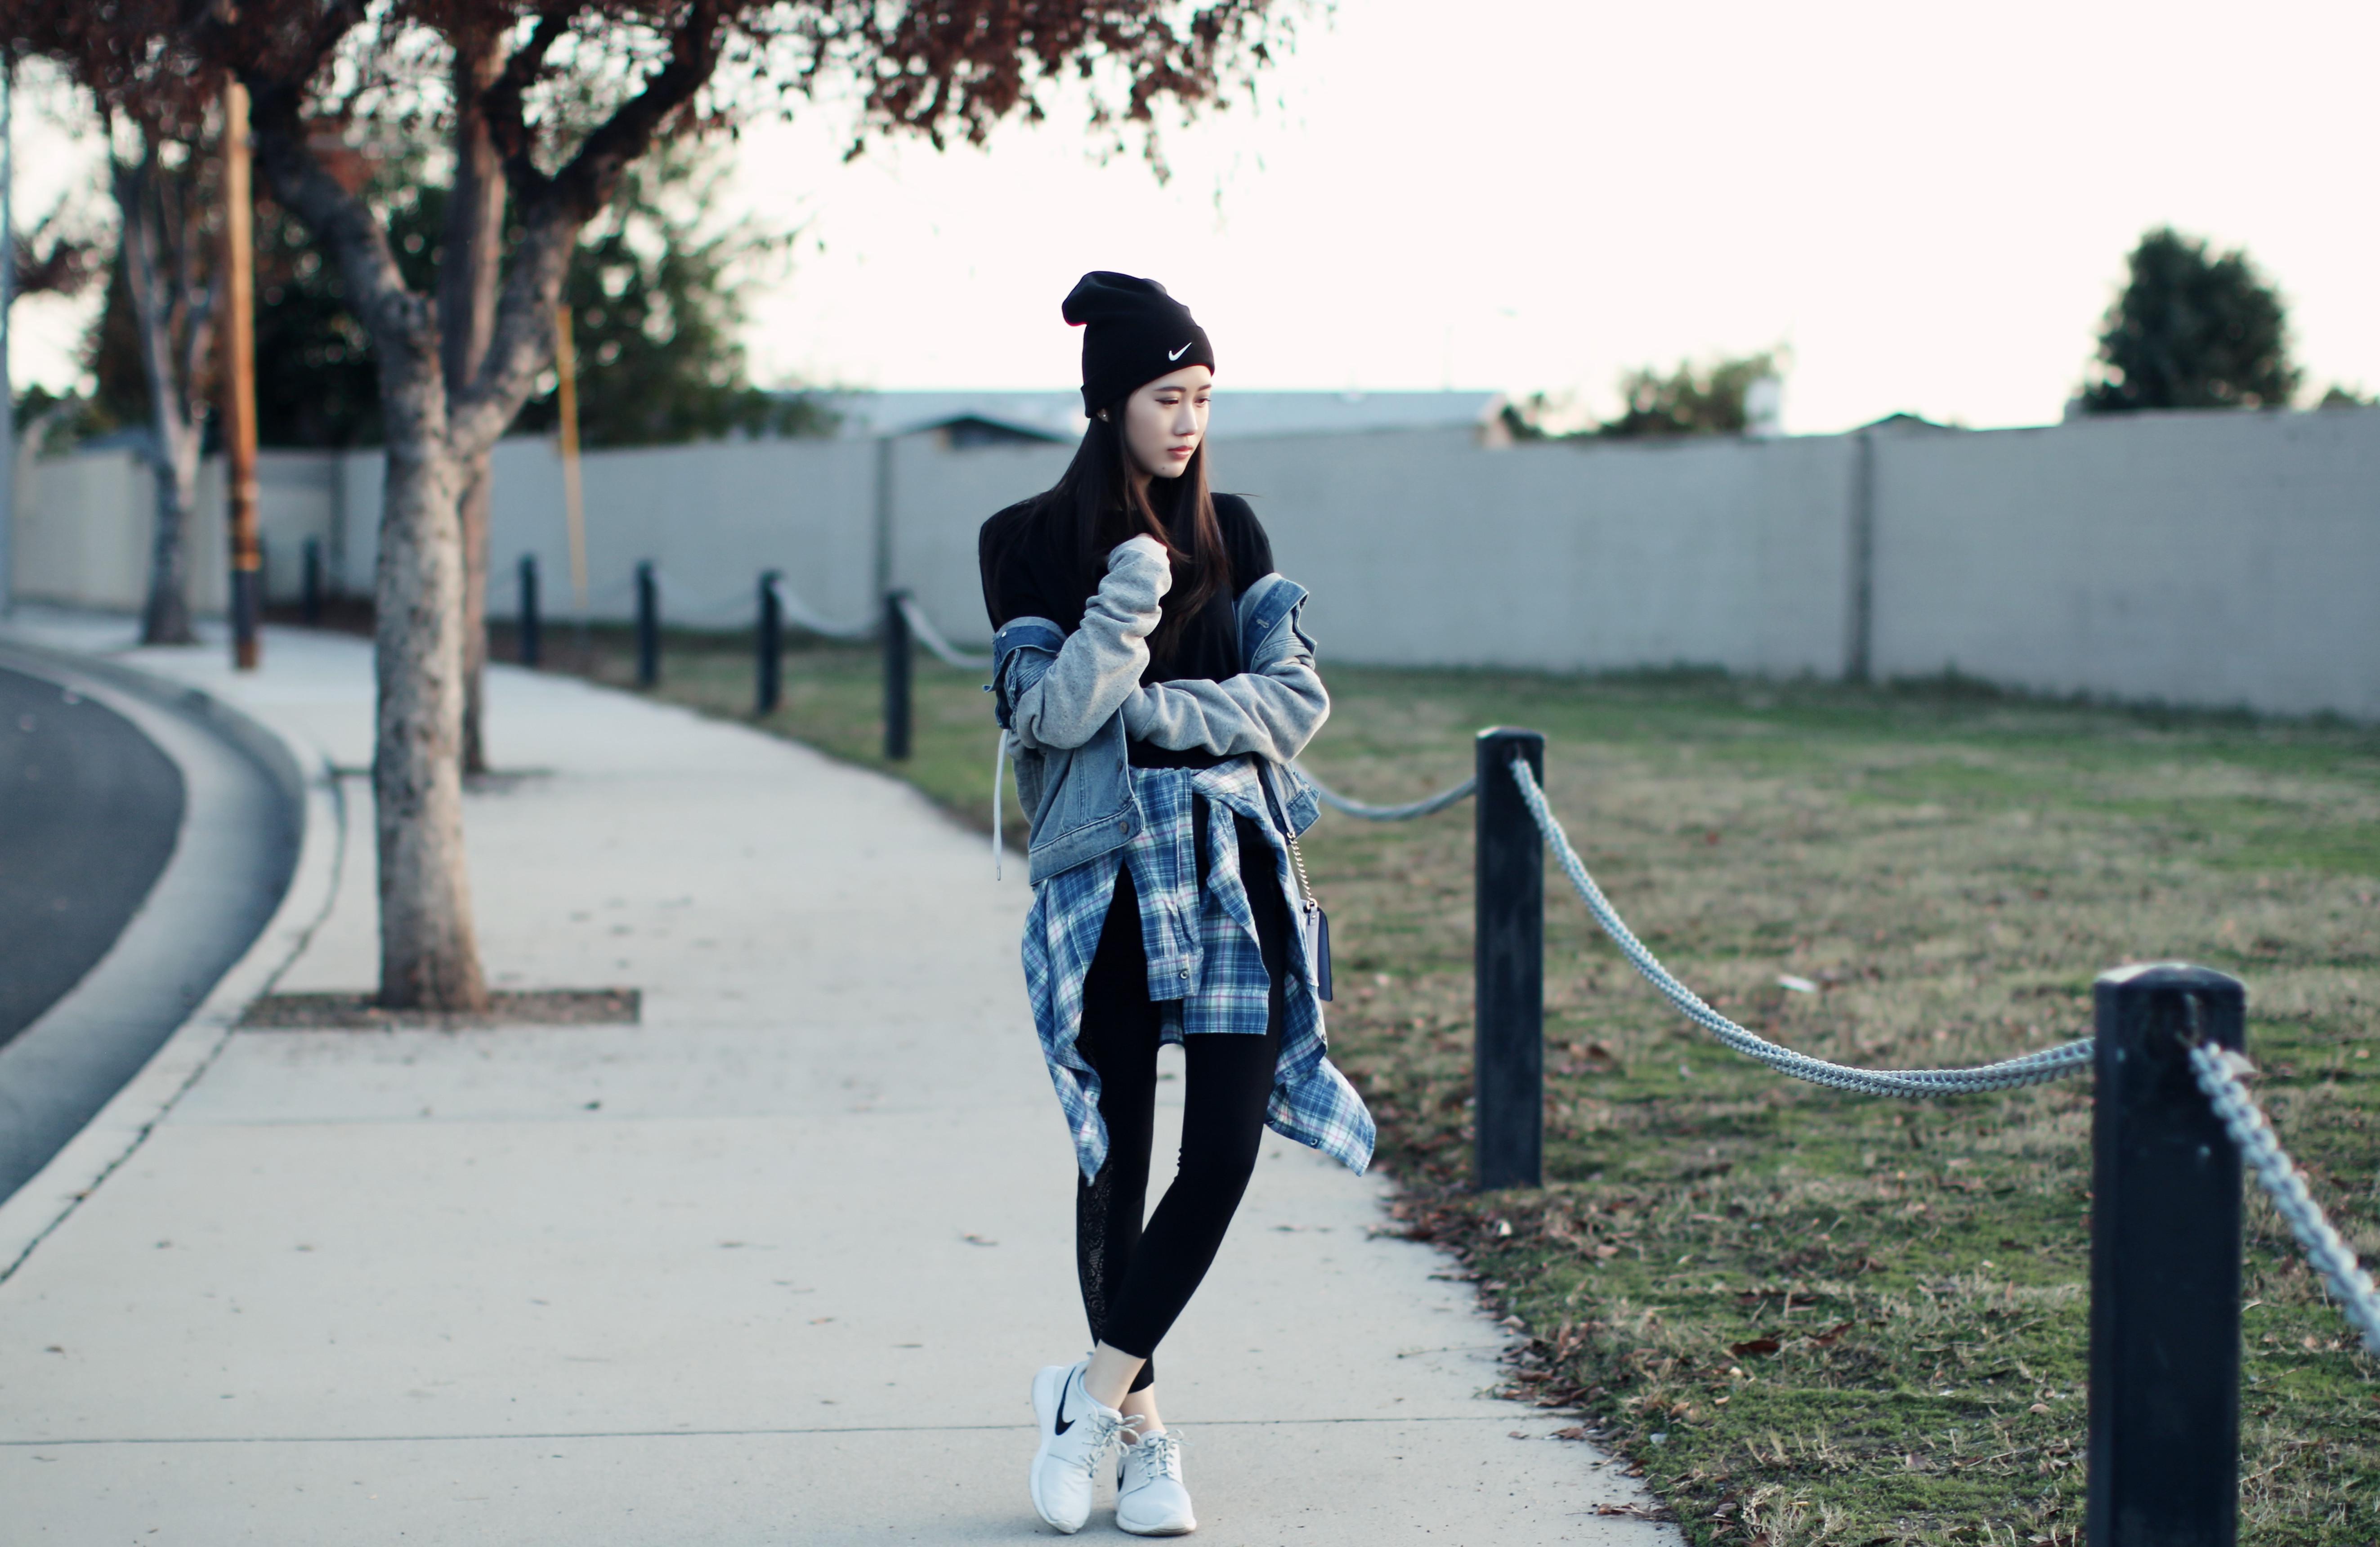 4313-ootd-fashion-style-outfitoftheday-wiwt-streetstyle-urbanoutfitters-hm-f21xme-nike-elizabeeetht-clothestoyouuu